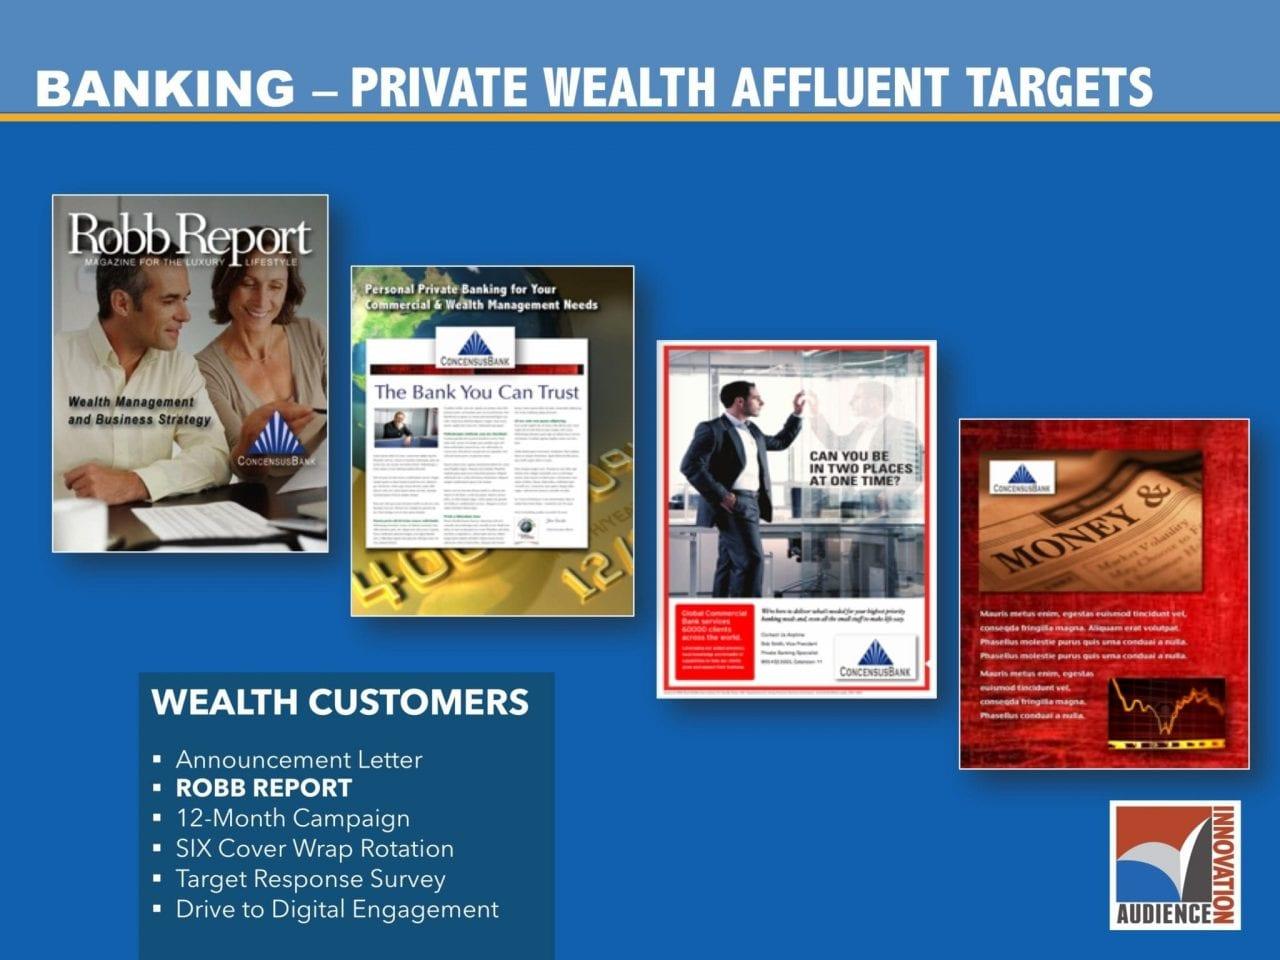 coverwrapmarketingbanking-1280x960.jpg